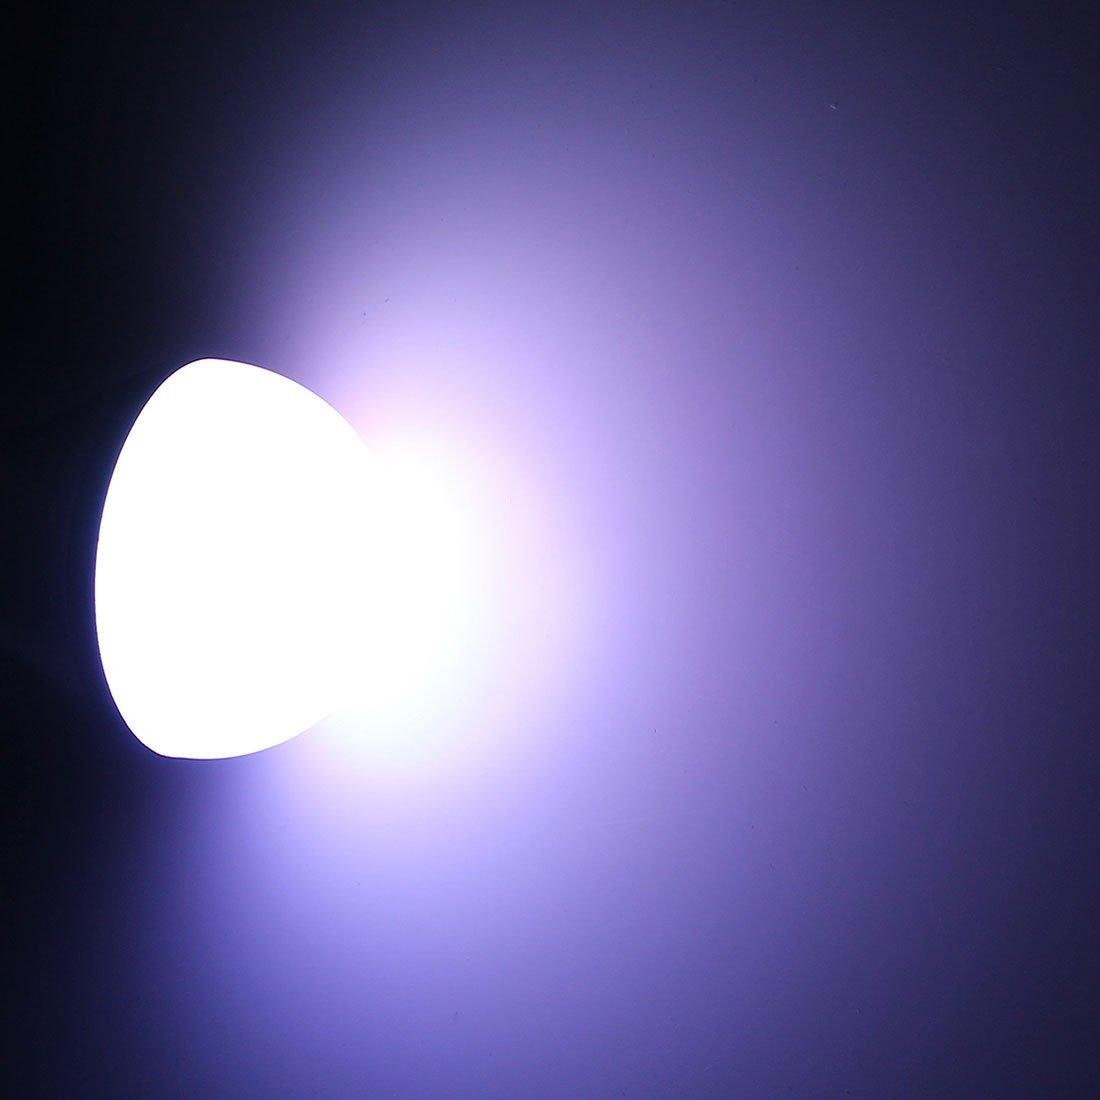 Del adaptador del bulbo B22 eDealMax bola de la decoración de la lámpara RGB LED 5W AC 85V-265V w controlador remoto - - Amazon.com